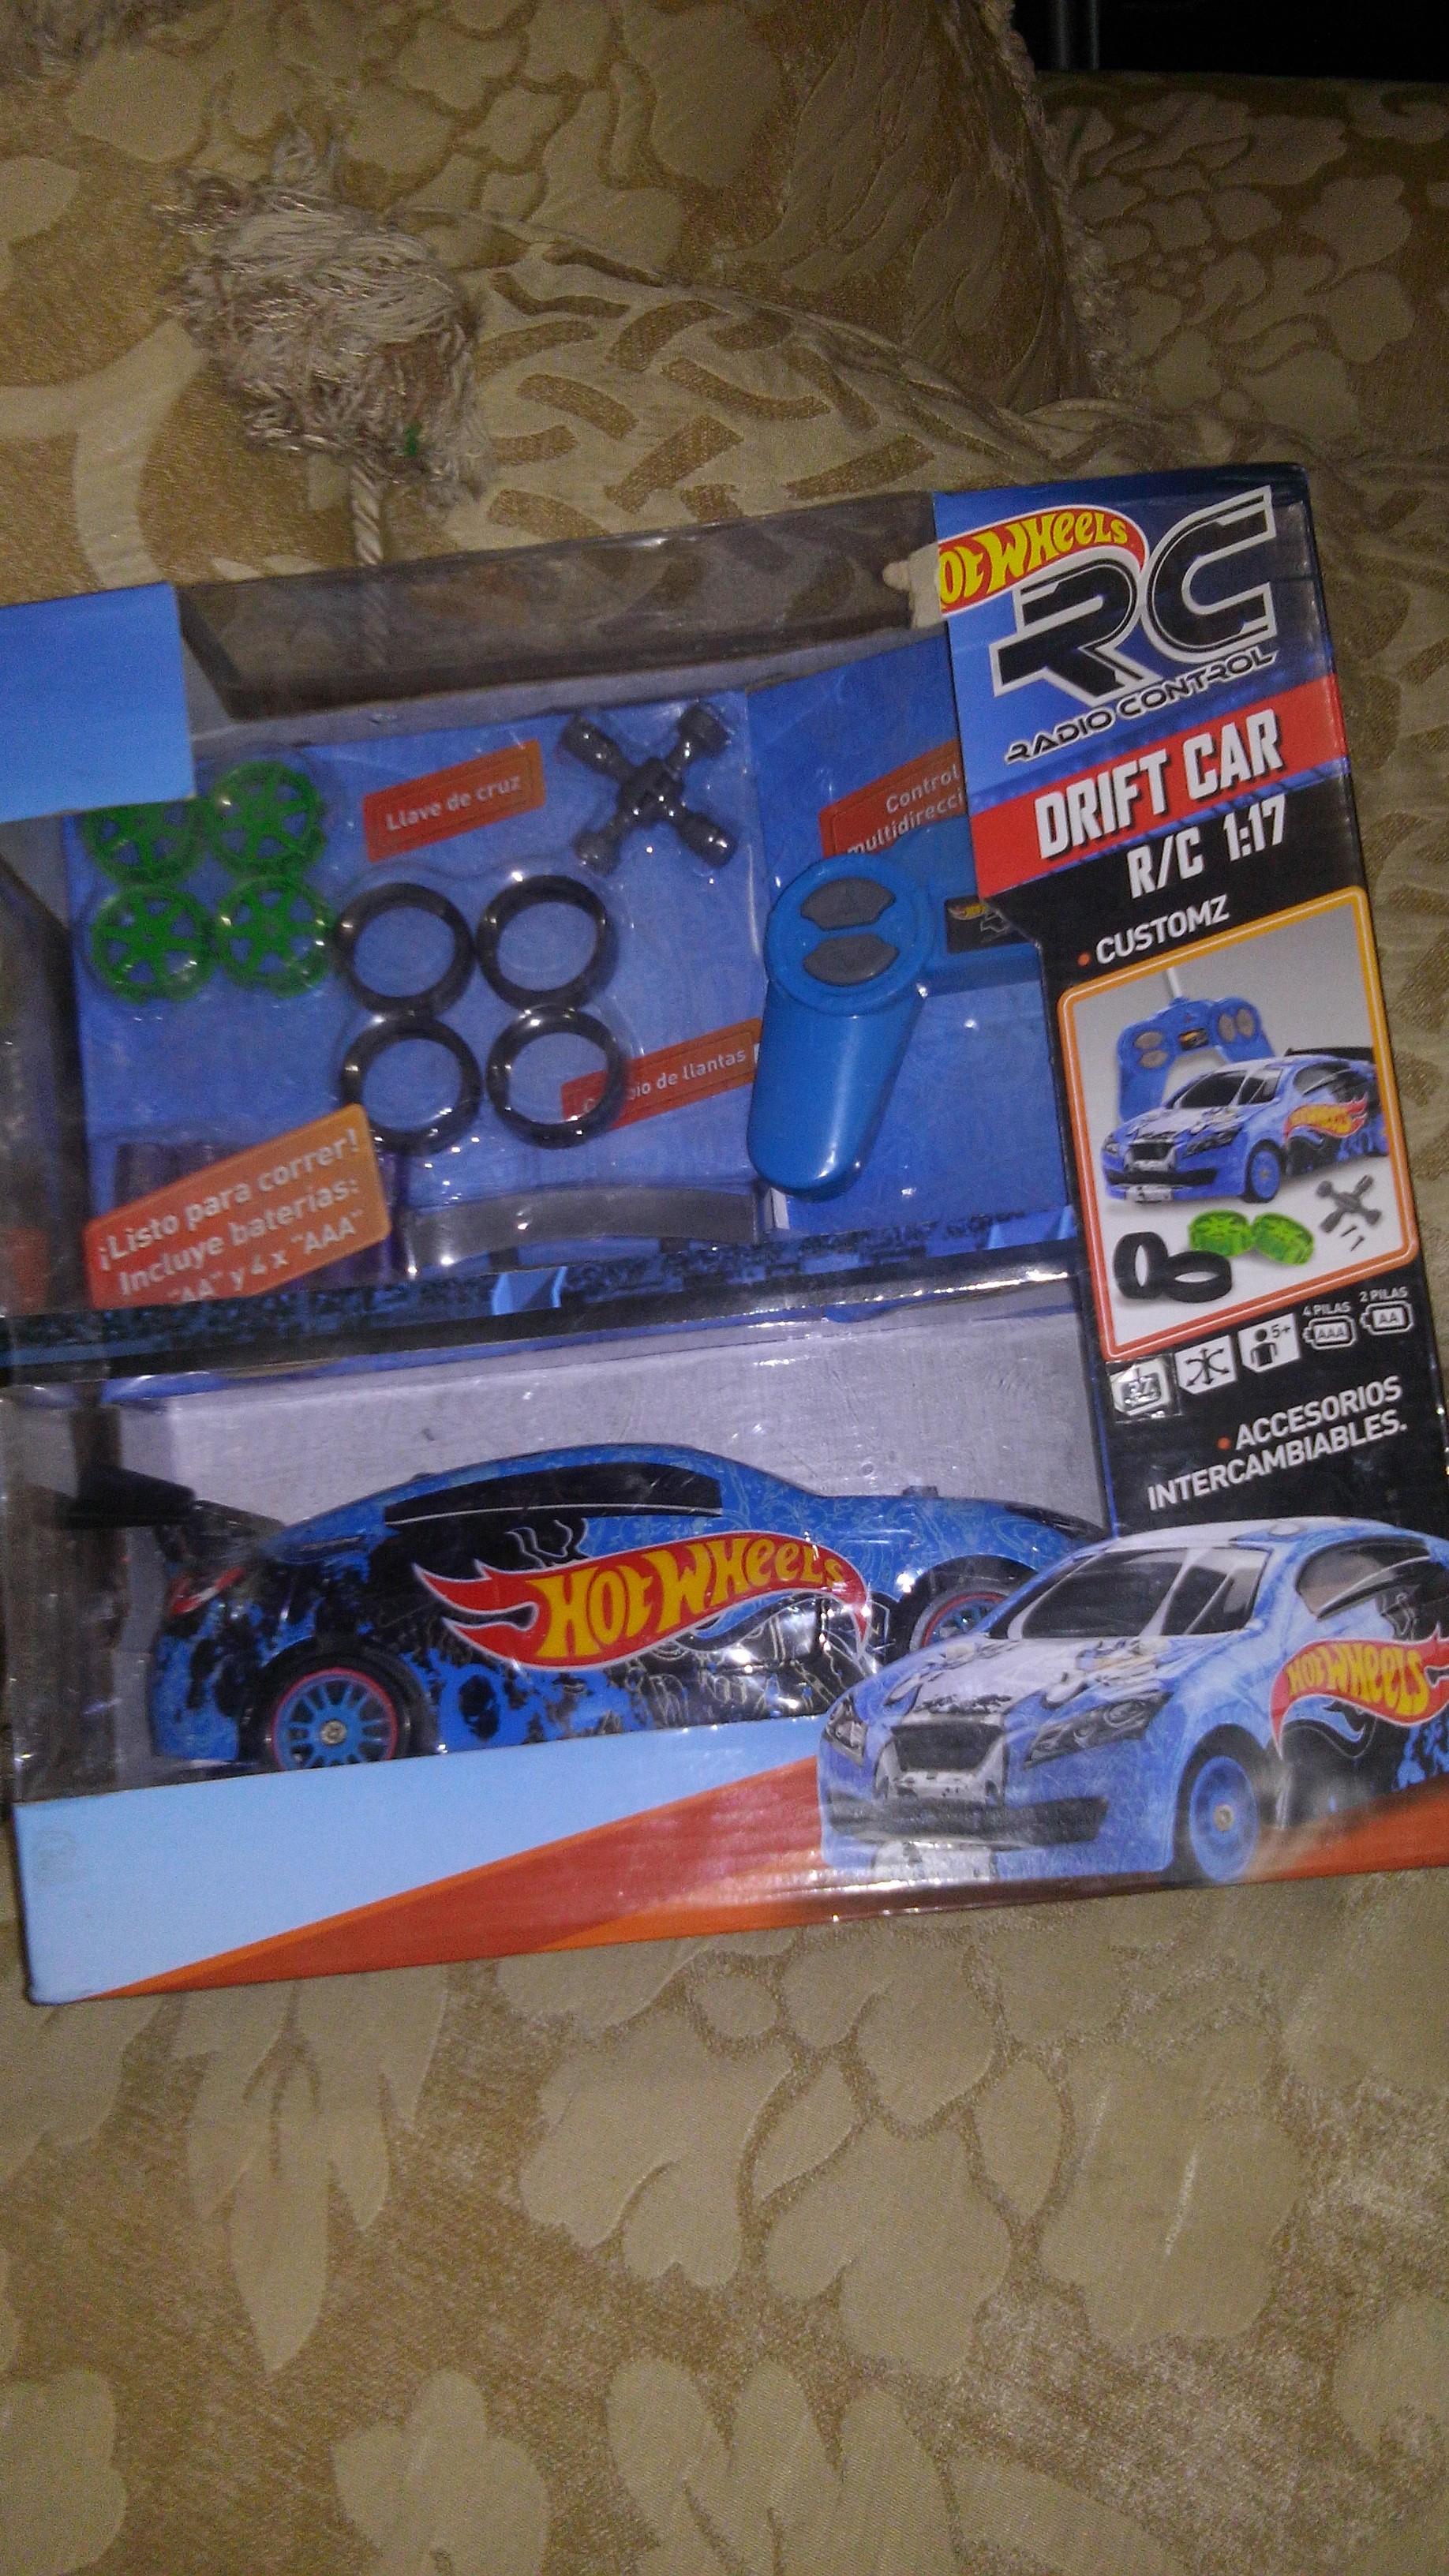 Bodega Aurrera Carro Control Hot Wheels $93.02 y Set de Trocas Monstruo $143.03